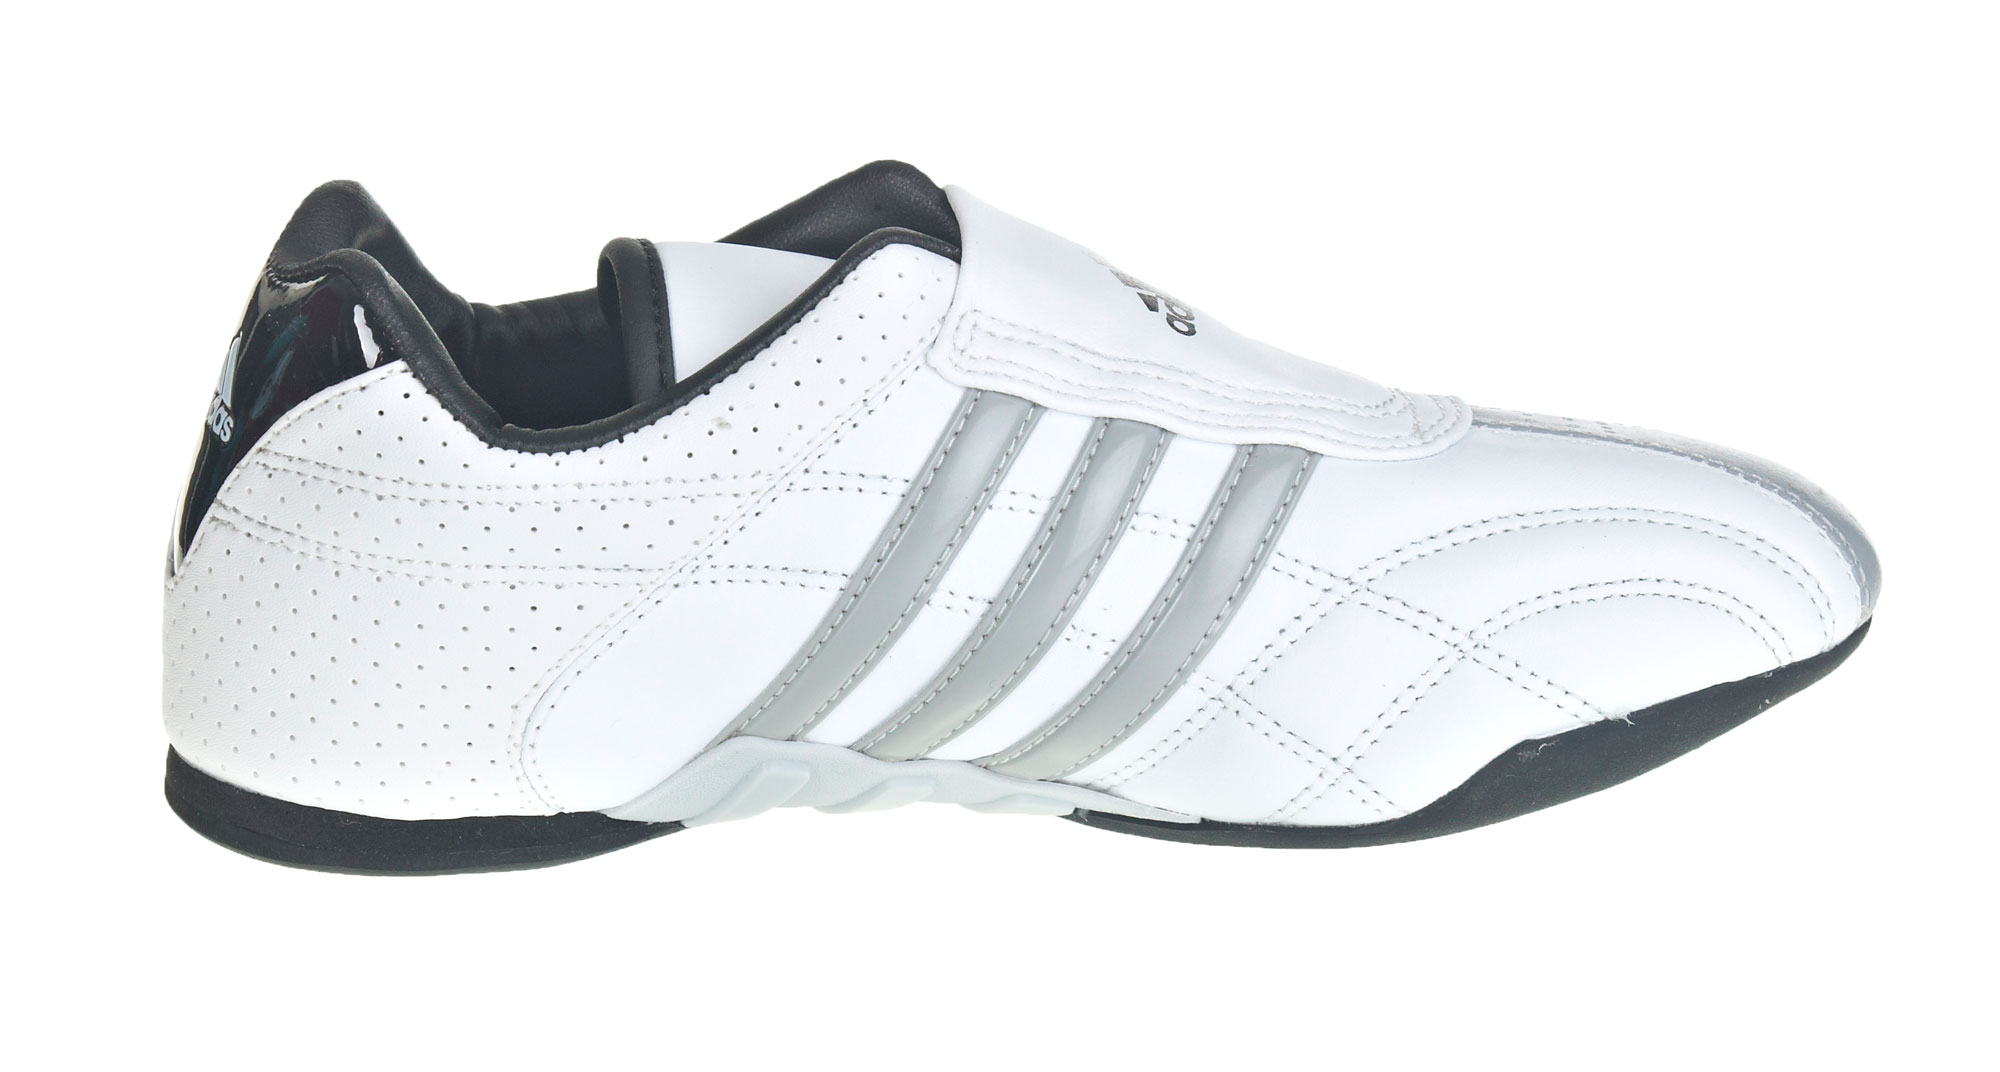 adidas adilux TKD sneakers white grey stripes